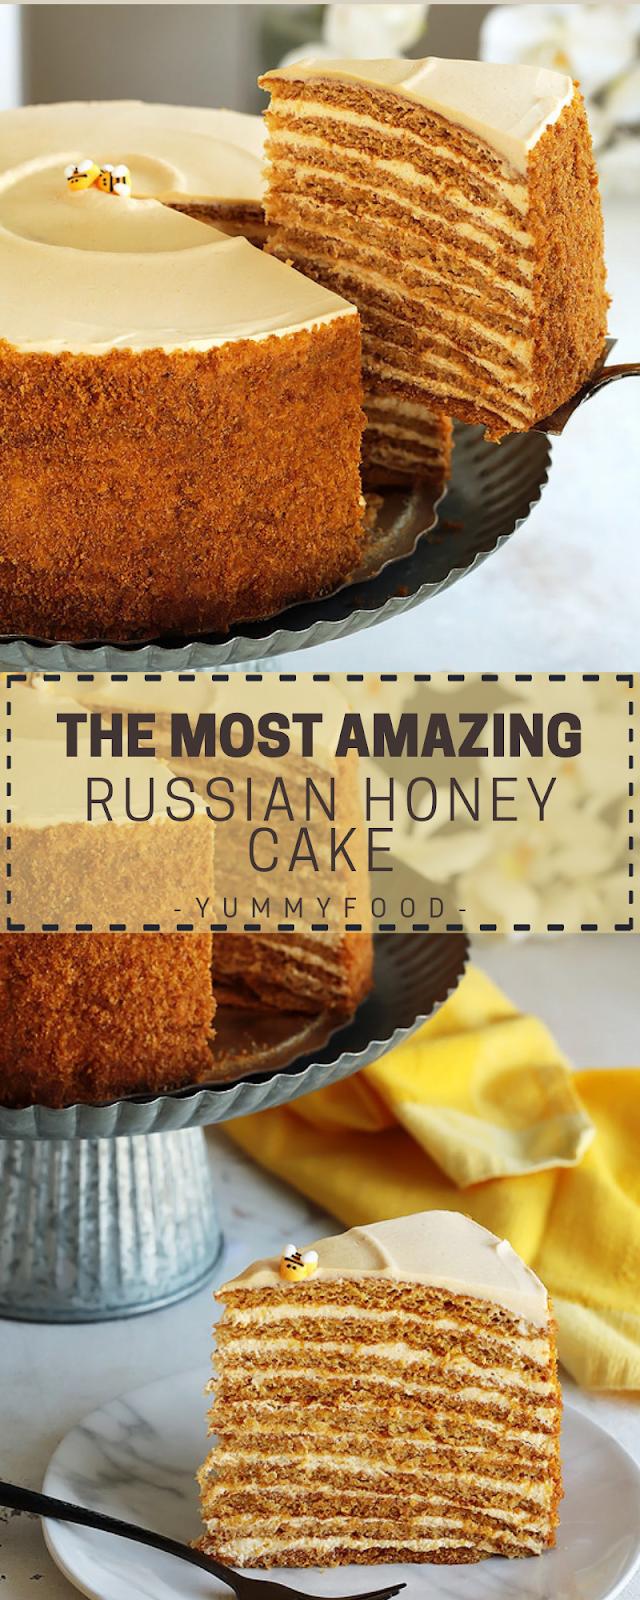 THE MOST BEAUTIFUL RUSSIAN HONEY CAKE